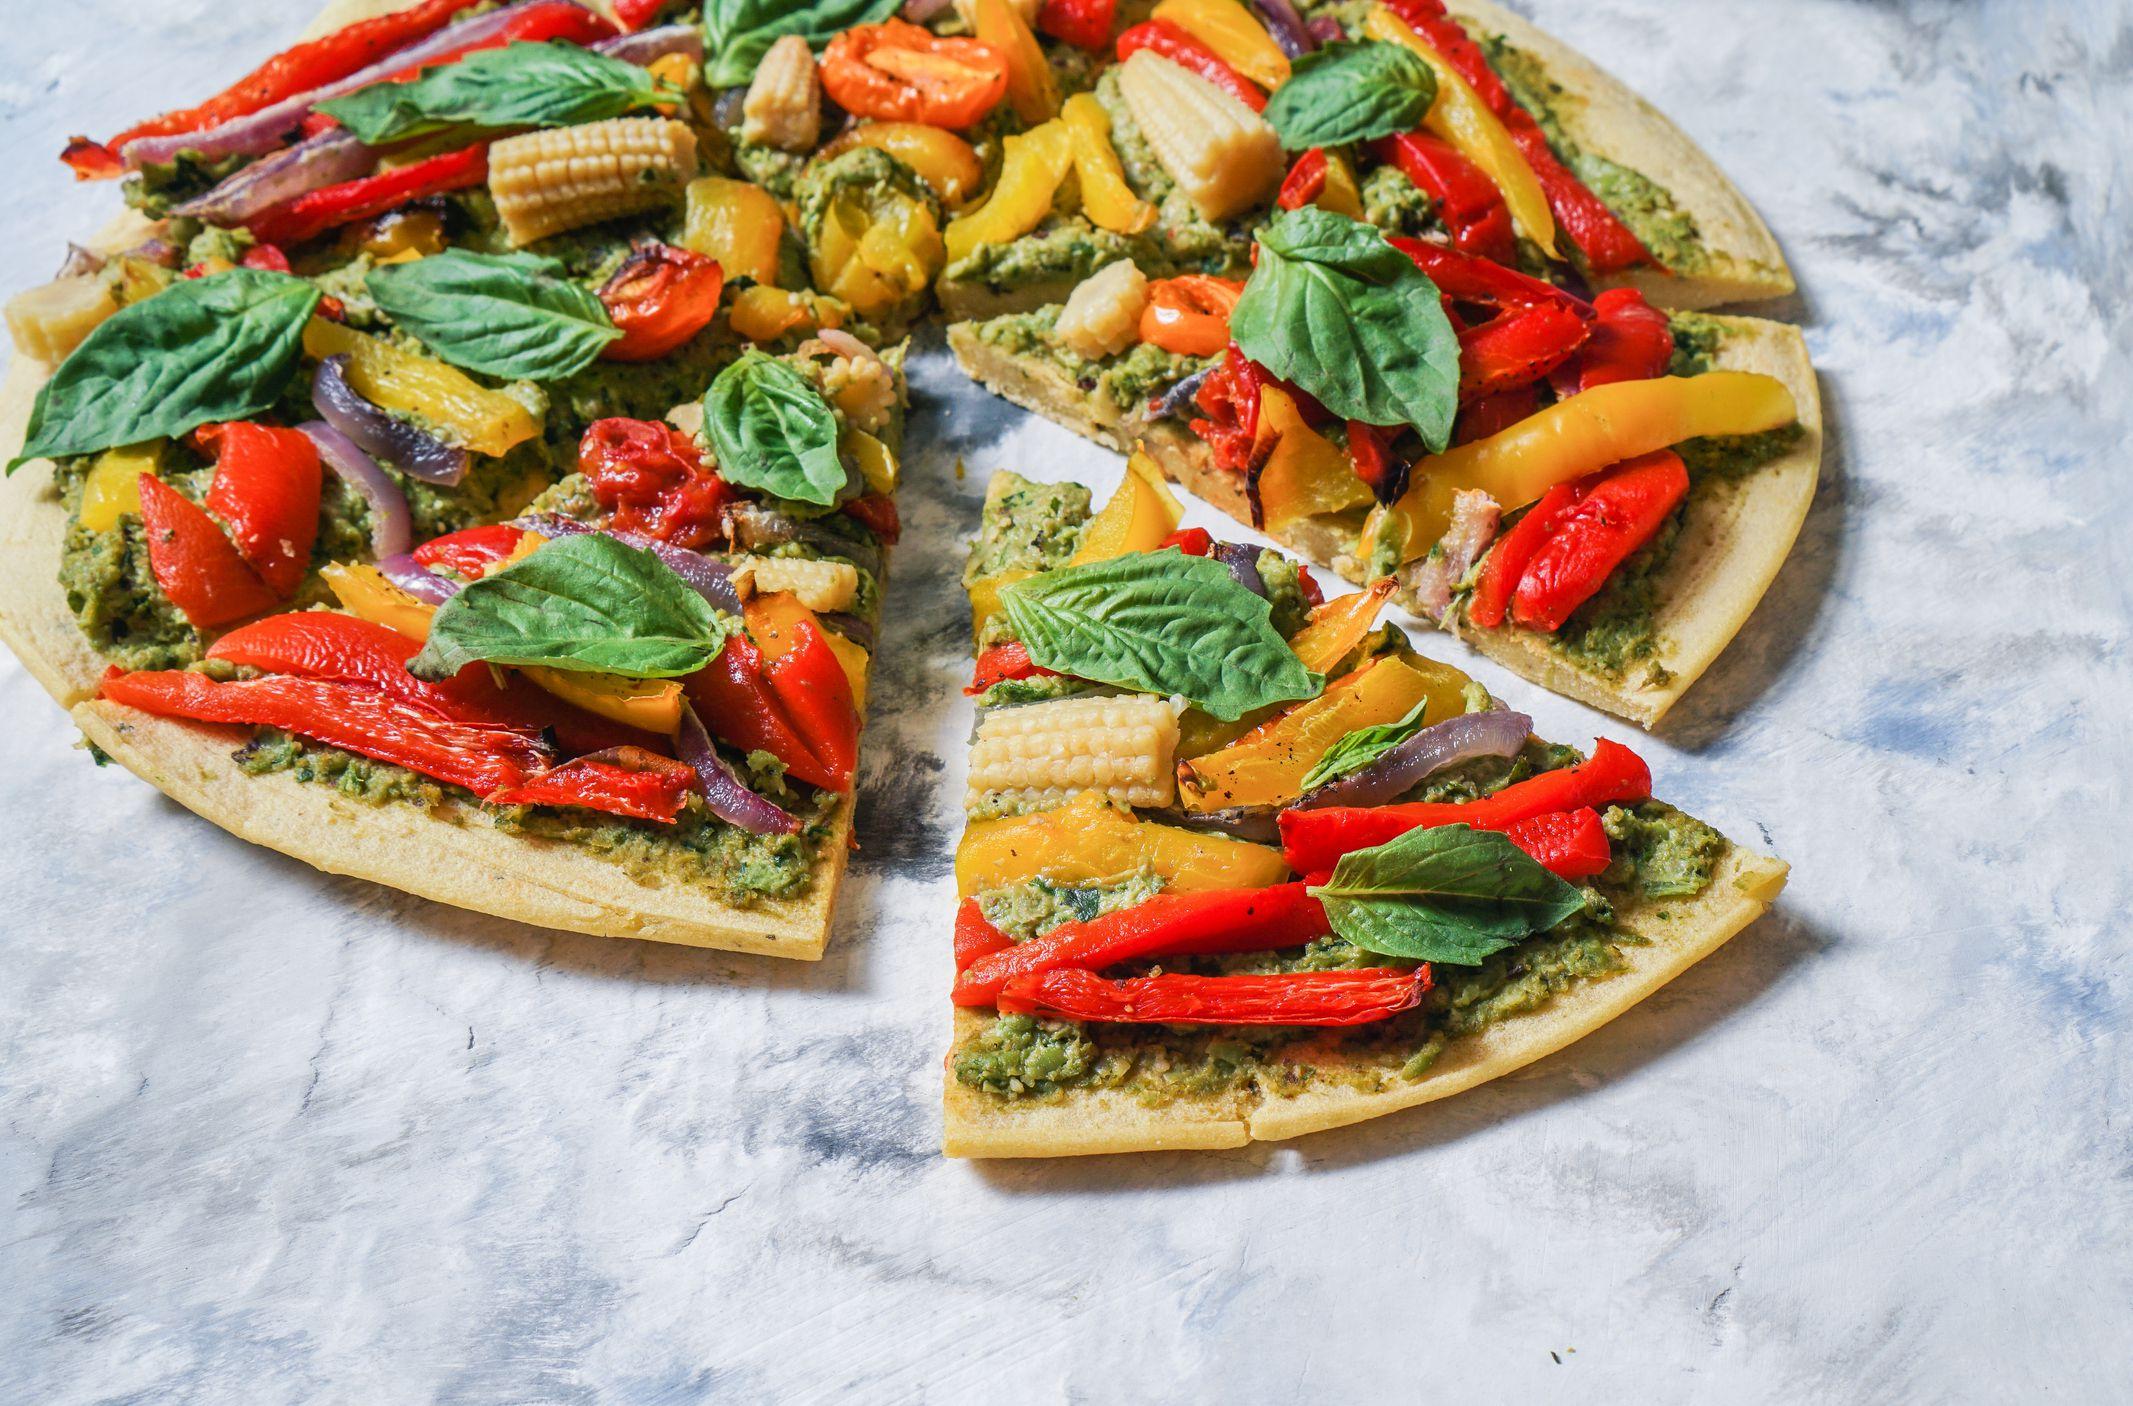 california pizza kitchen app red valance vegan gluten free pizzas